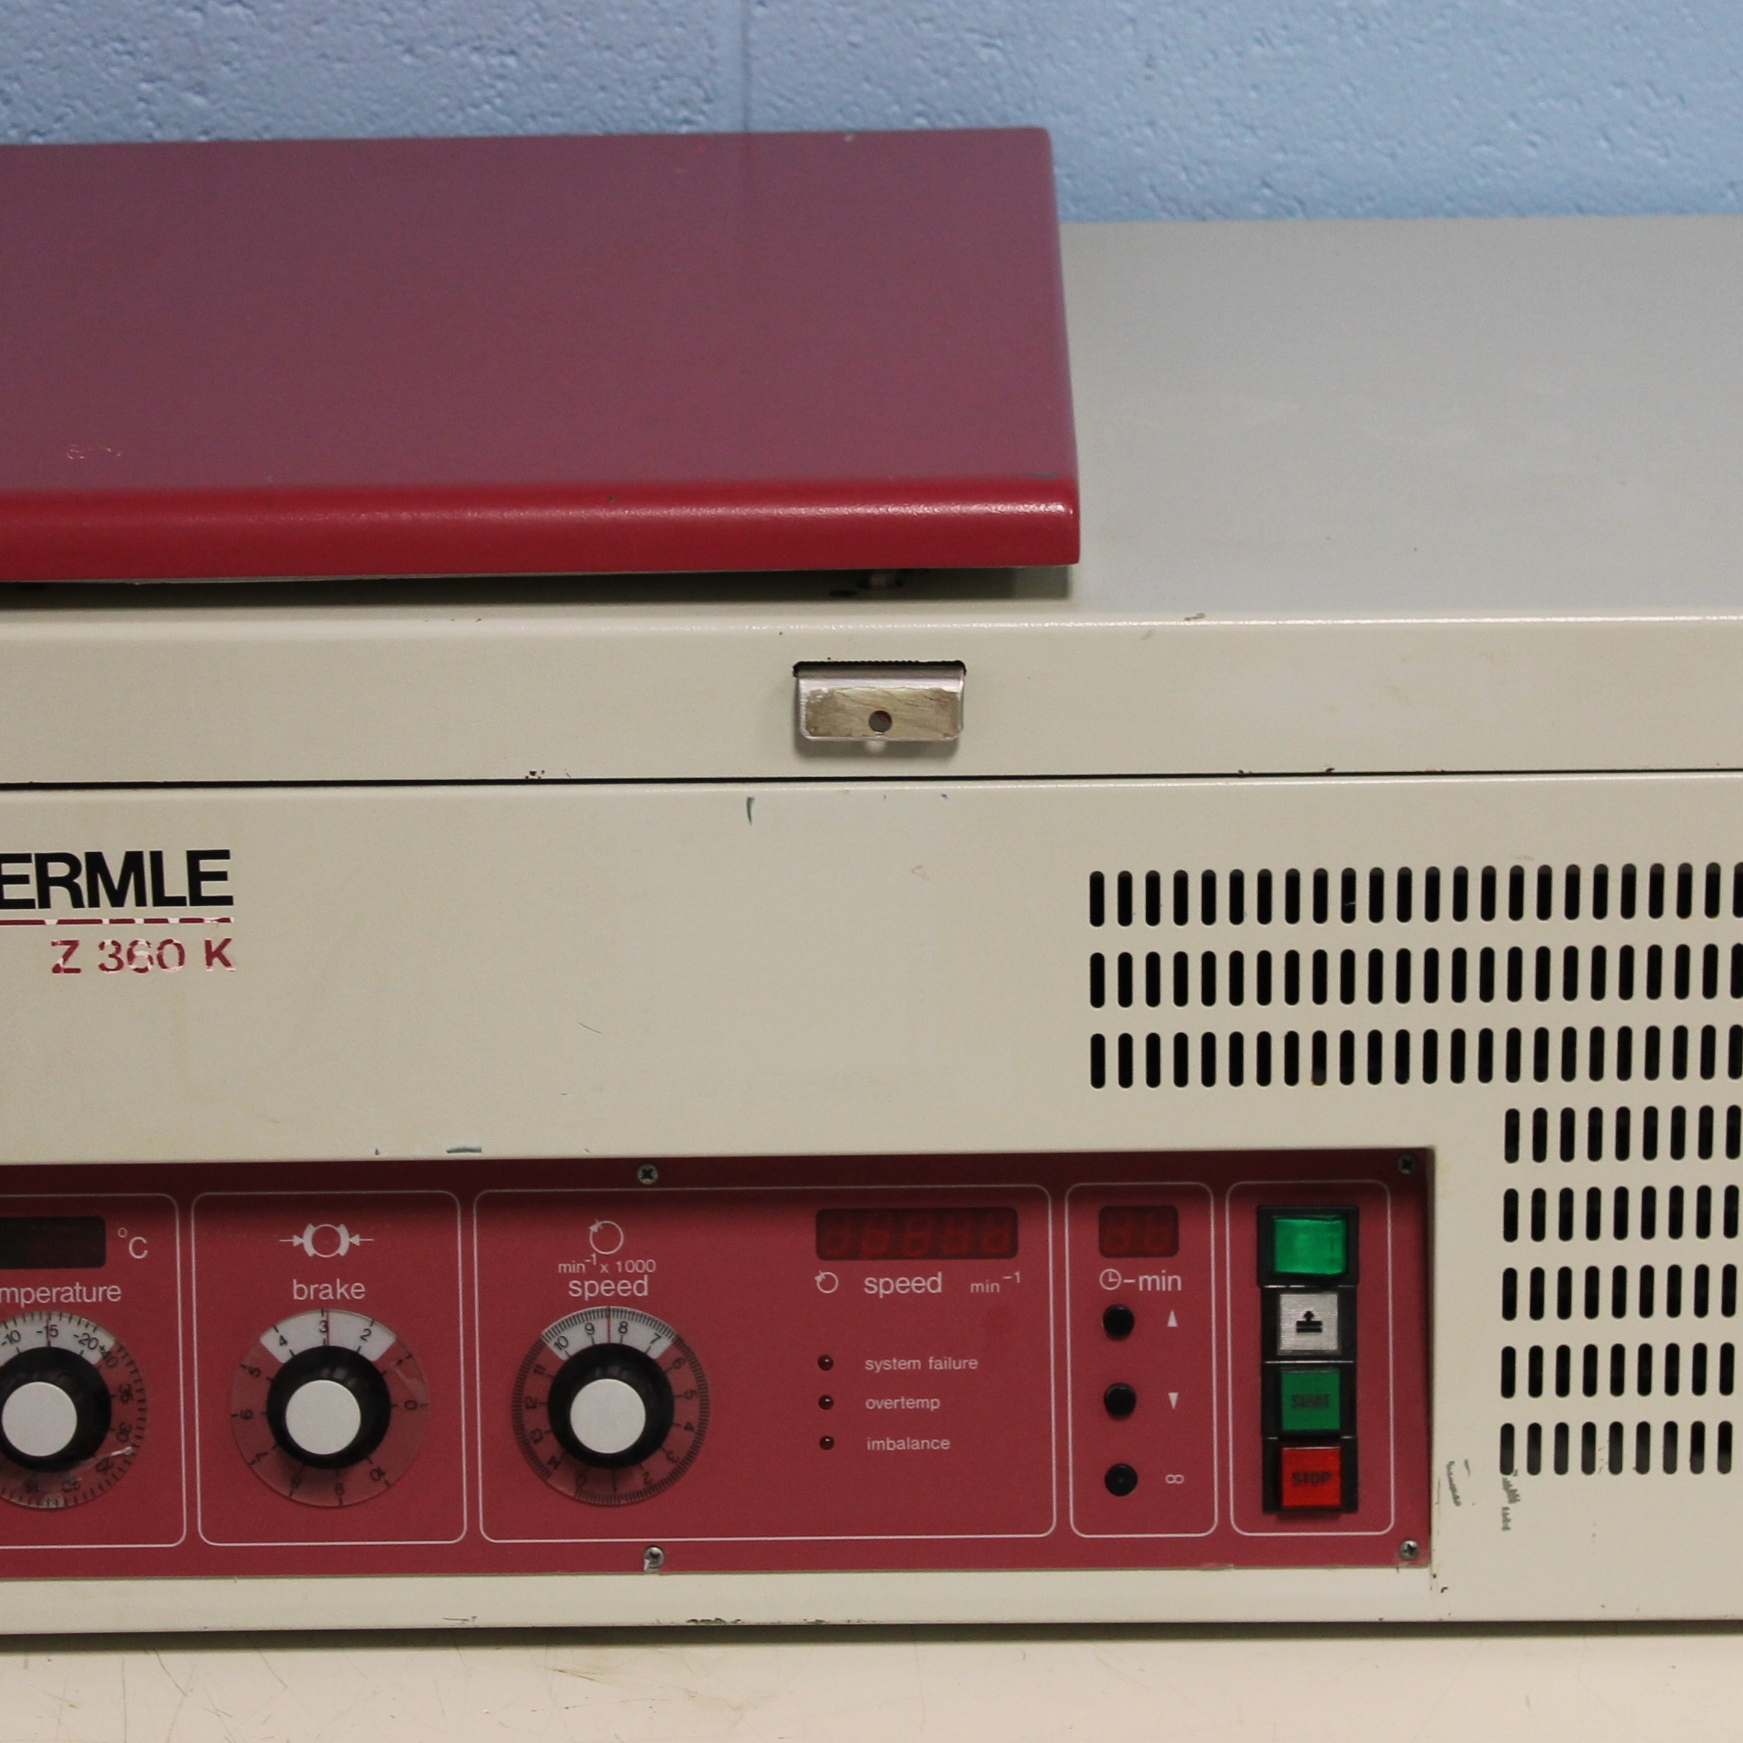 Hermle Z 360 K Refrigerated Centrifuge Image